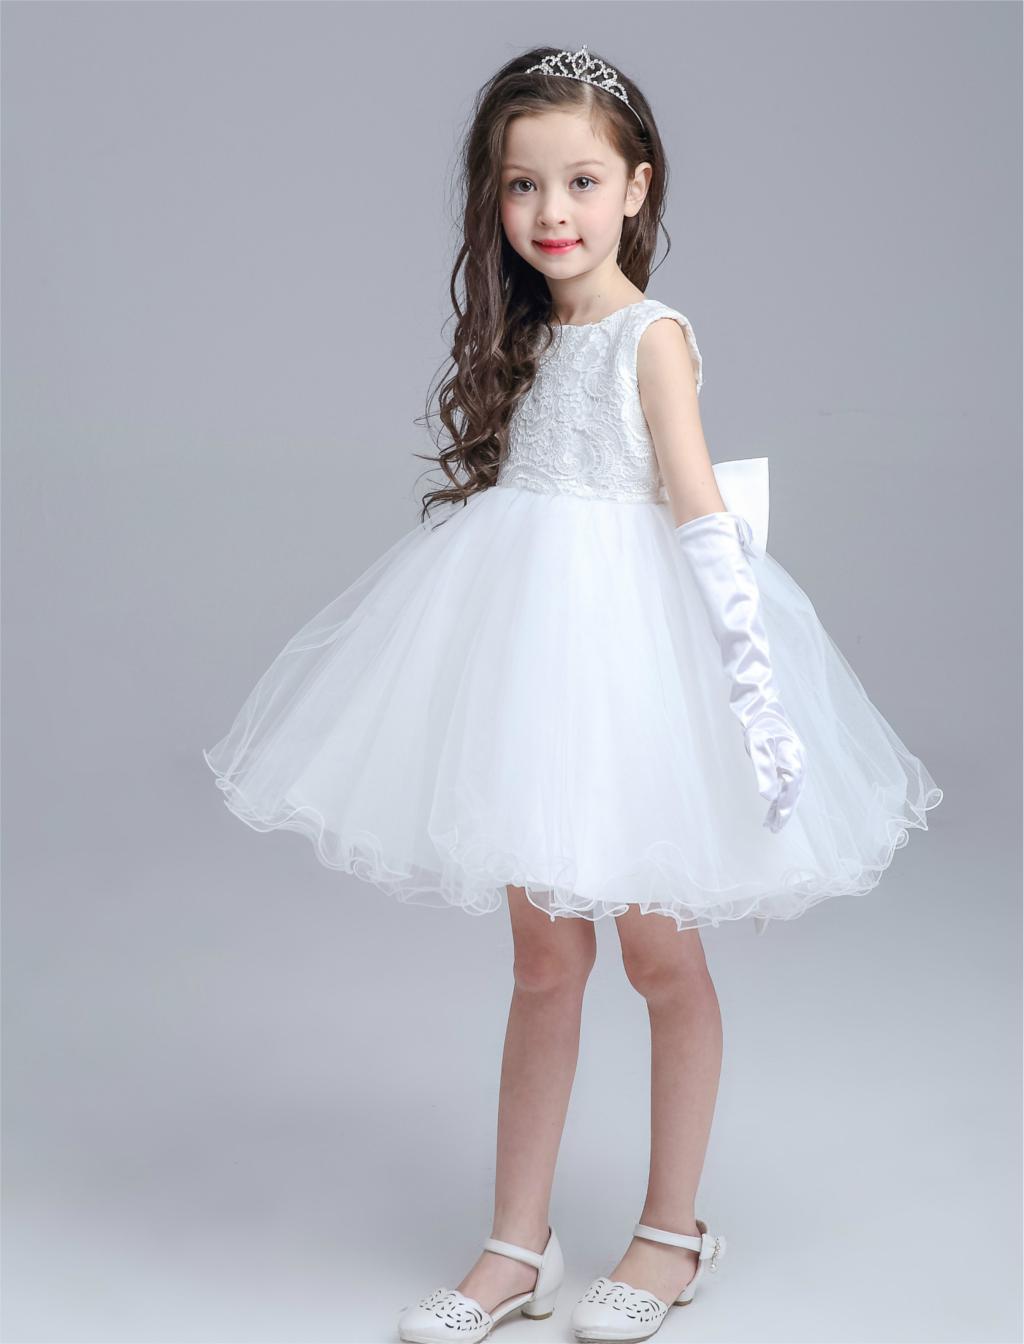 High end Grey Girls Wedding Dress Princess Big Bow Sleeveless Western  Children Party Wear Vestidos 2017 Girls Clothes AKF164040-in Dresses from  Mother ... 15bdf4893d56